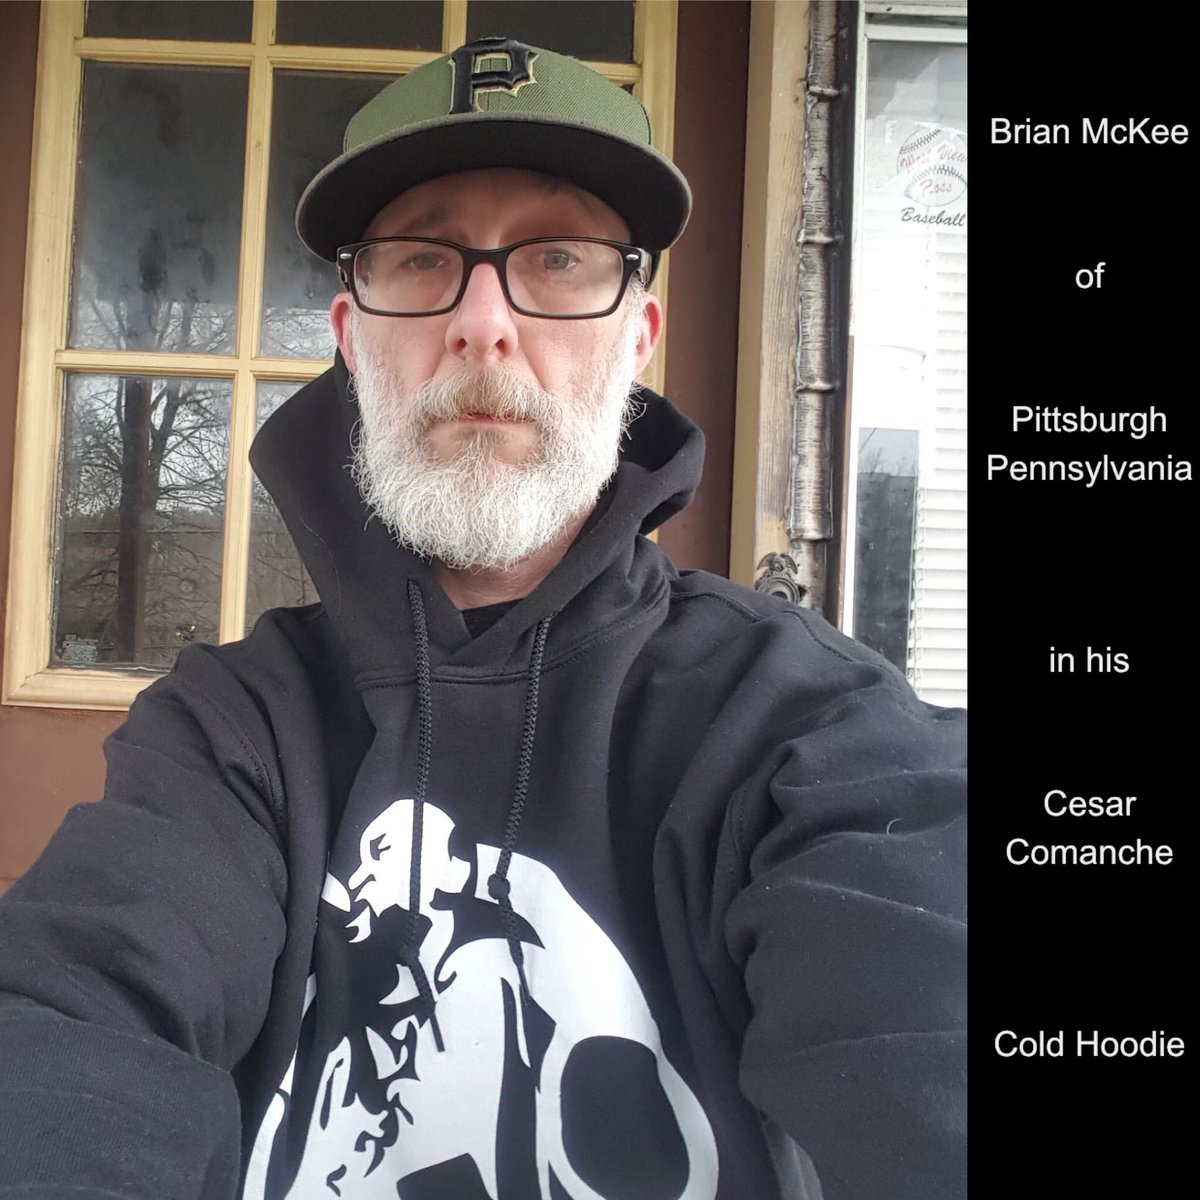 #cesarcomanche #justusleague #hoodie #hoodieseason #pittsburgh #pennsylvaniapic.twitter.com/fJgzeF1RWB